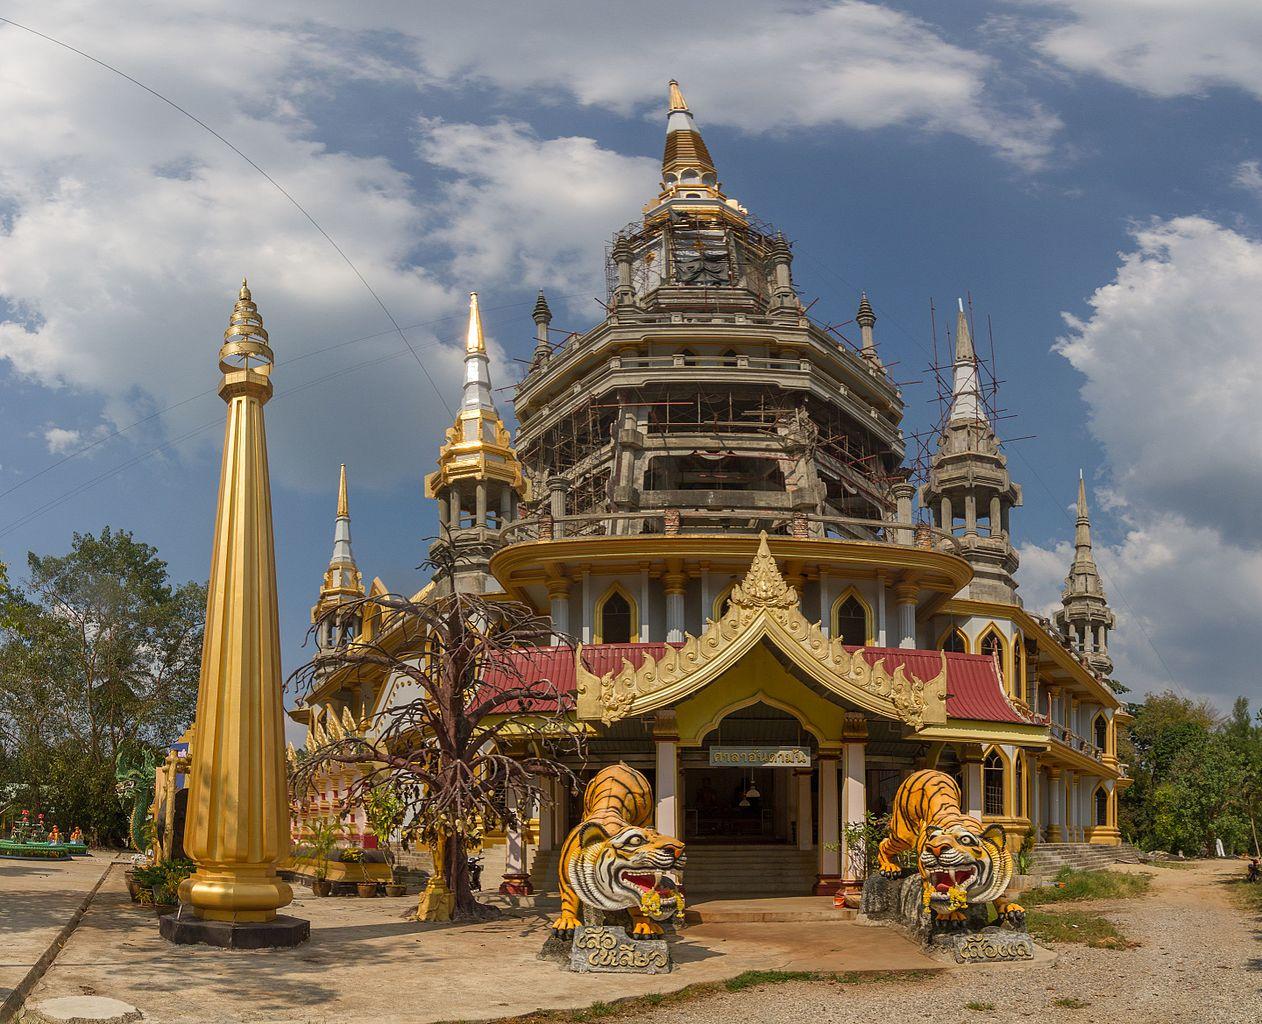 Tiger Cave Temple, Krabi in Thailand